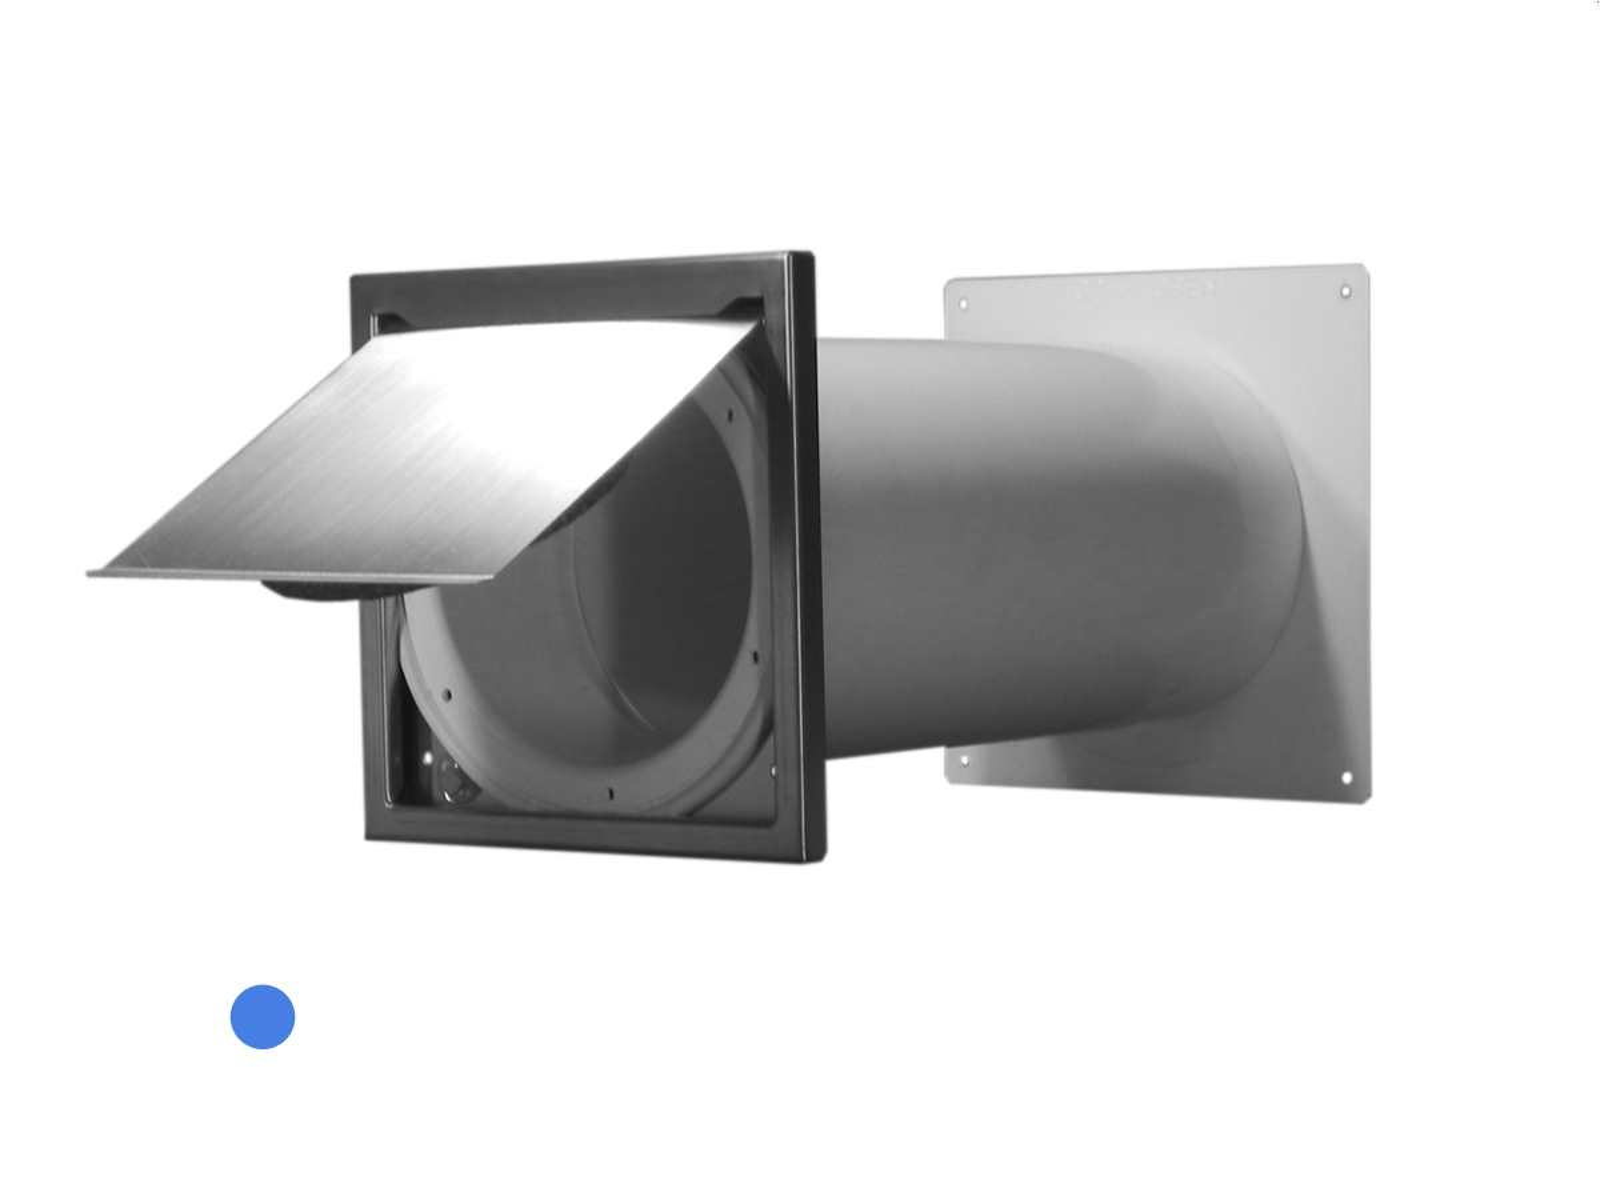 Aqua Light easyPumpe EP 8000 mit Digitalsteuerung Pumpe Tauchpumpe bis 8000 Lite